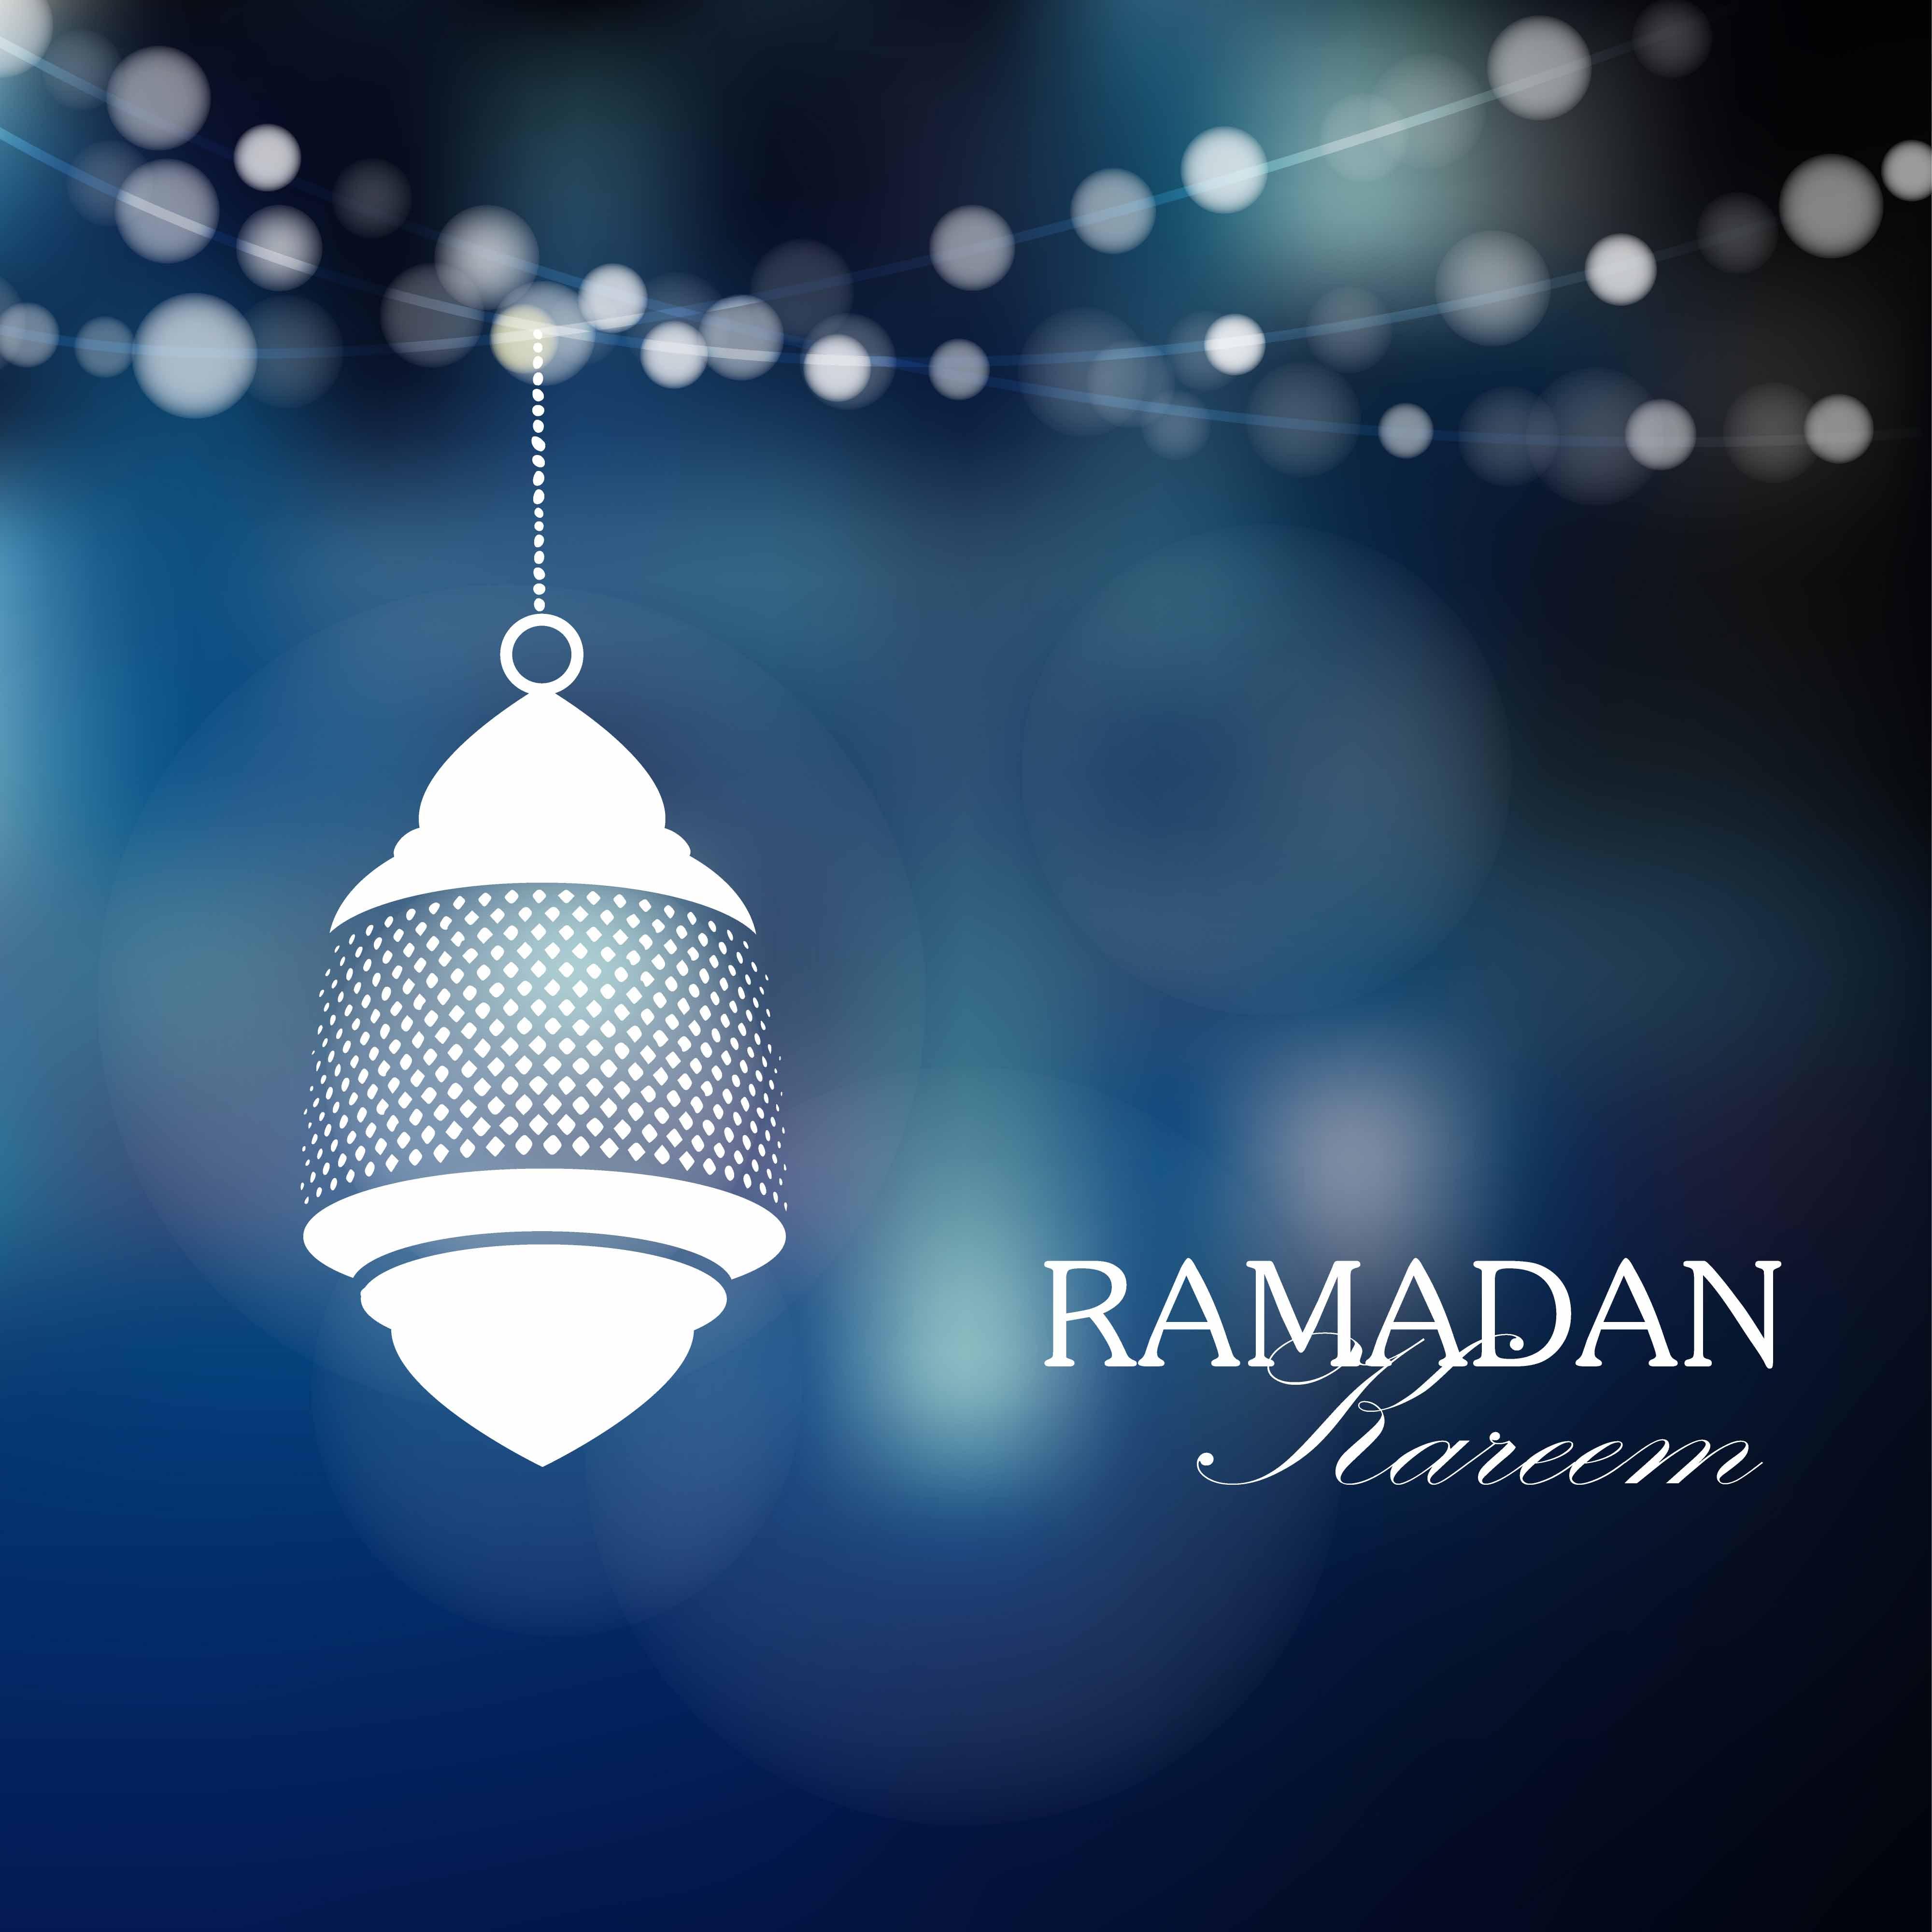 Ramadan Mubarak In Arabic Wallpapers 2017 - Wallpaper Cave